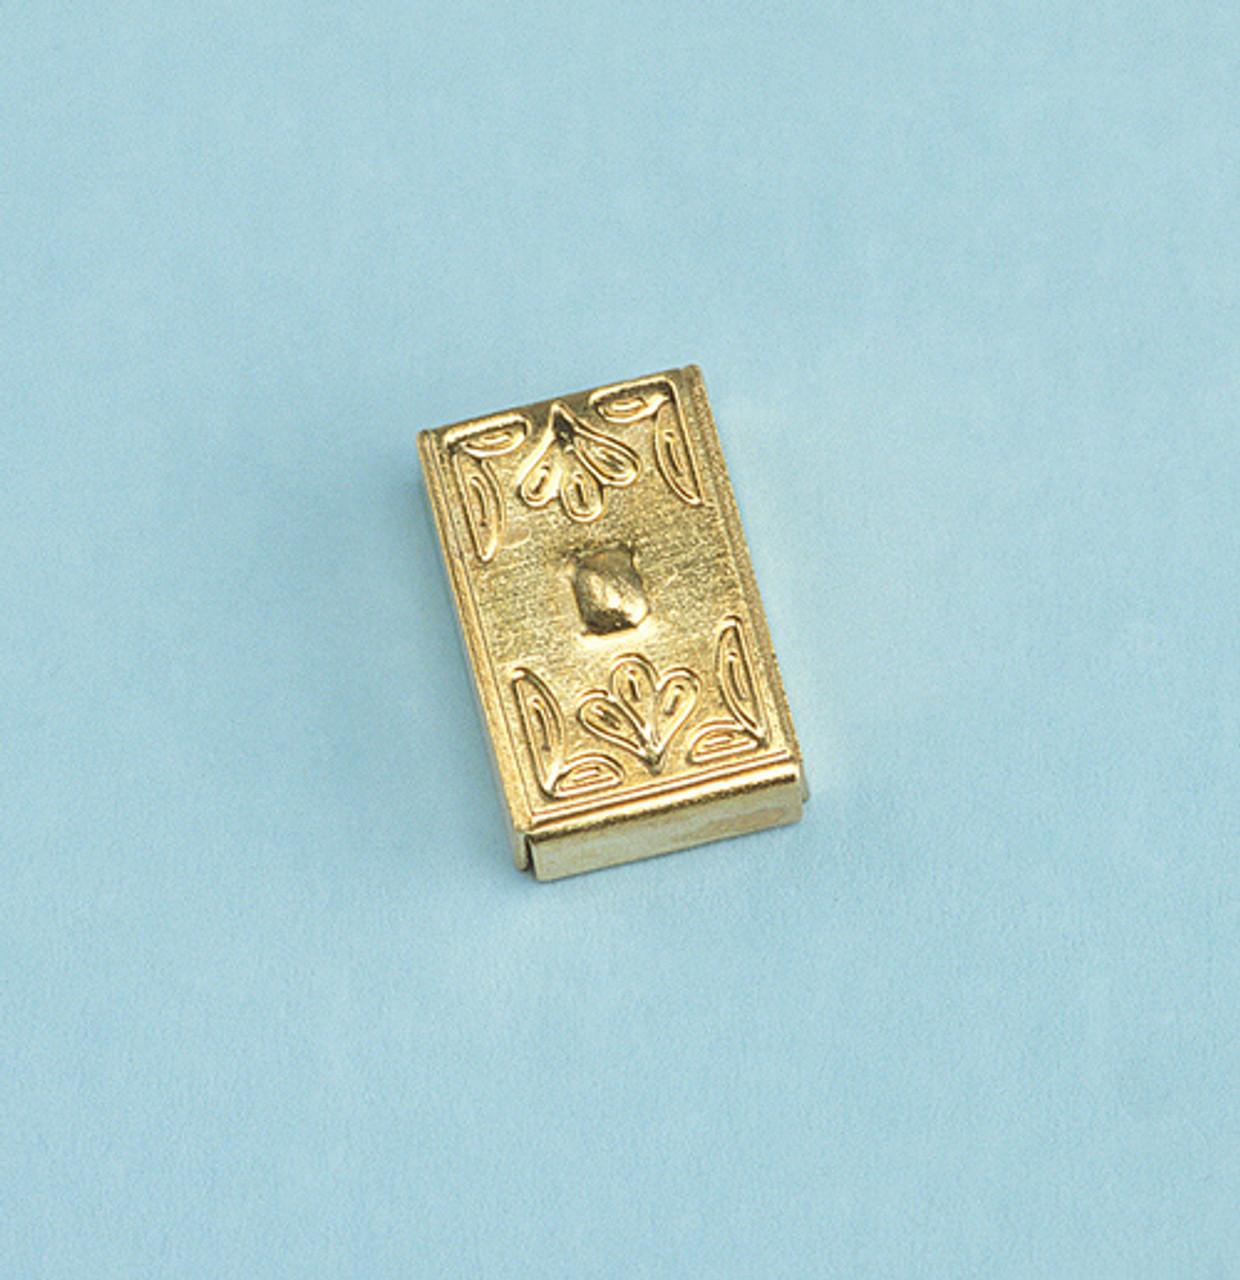 Dollhouse City - Dollhouse Miniatures Brass Switch Cover